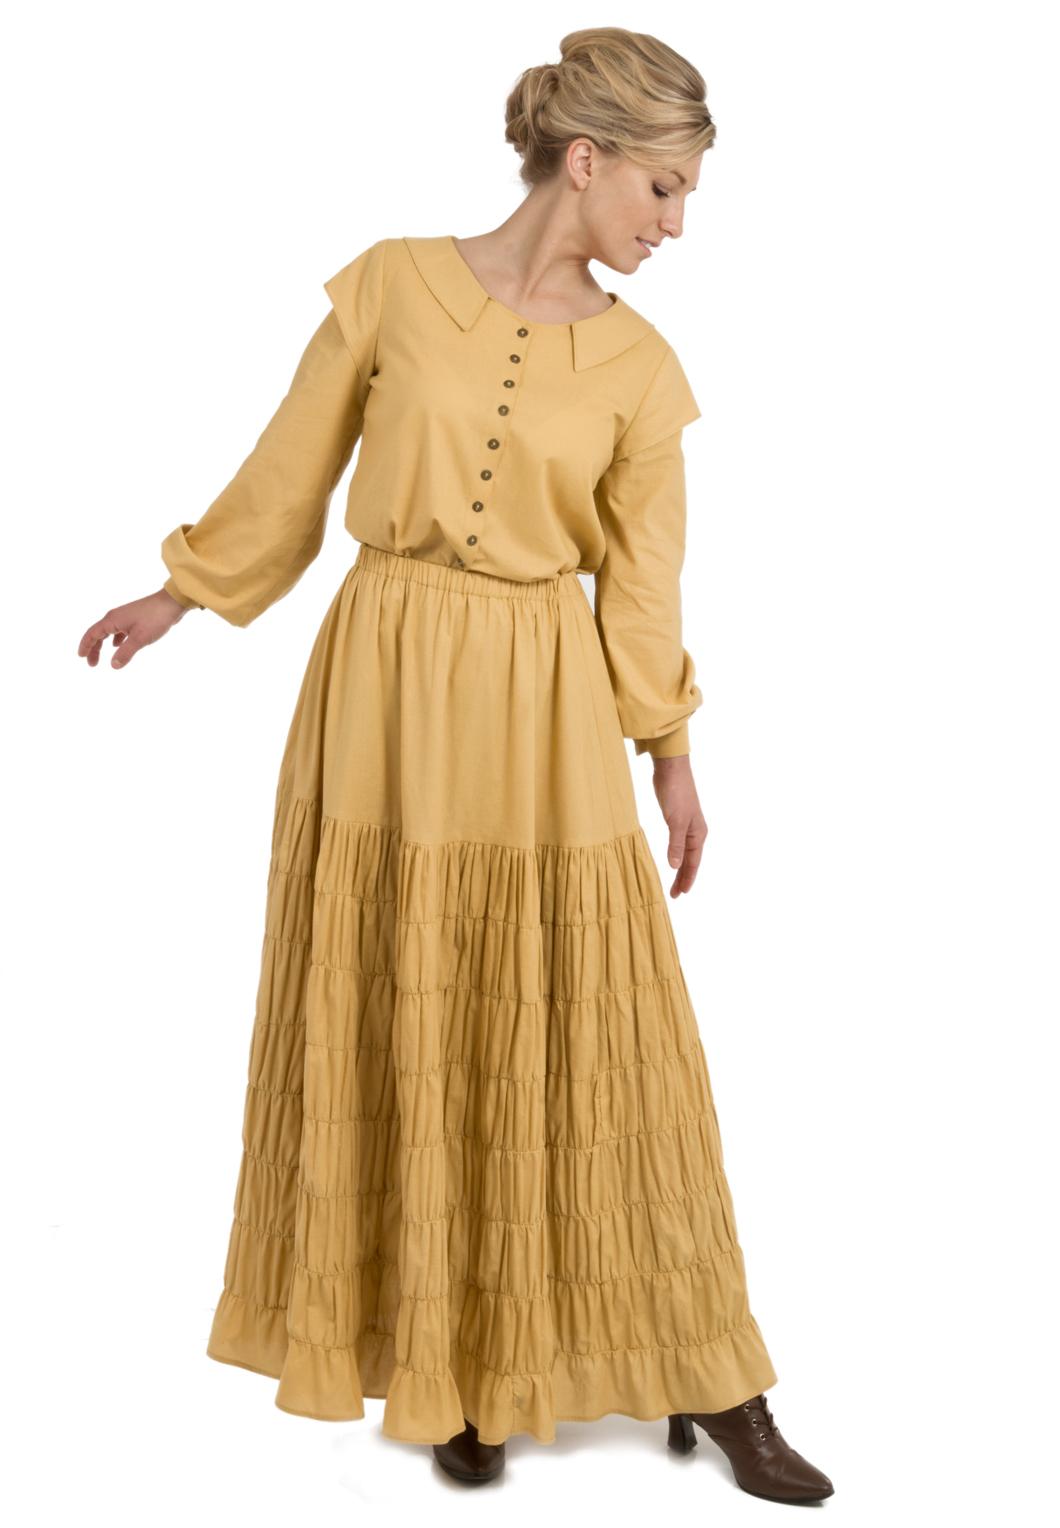 Old Fashioned Farm Dresses